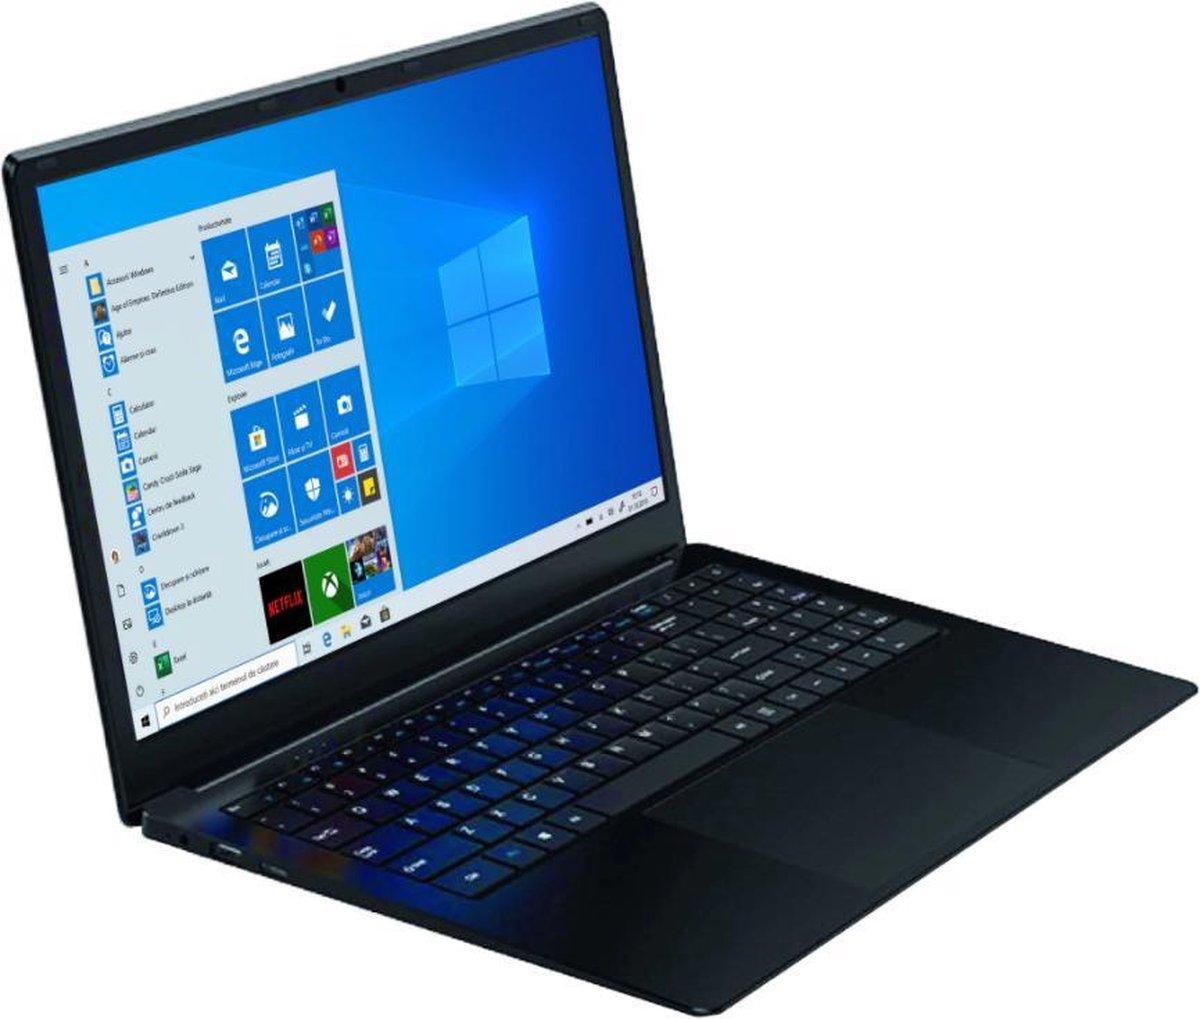 "Legend One laptop - Intel Dual Core - 4GB - 128GB SSD (64SSD-64MMC) - 14.1"" Full HD (1920x1080) - Mini-HDMI - Windows 10 - AZERTY Toetsenbord (Belgisch)"